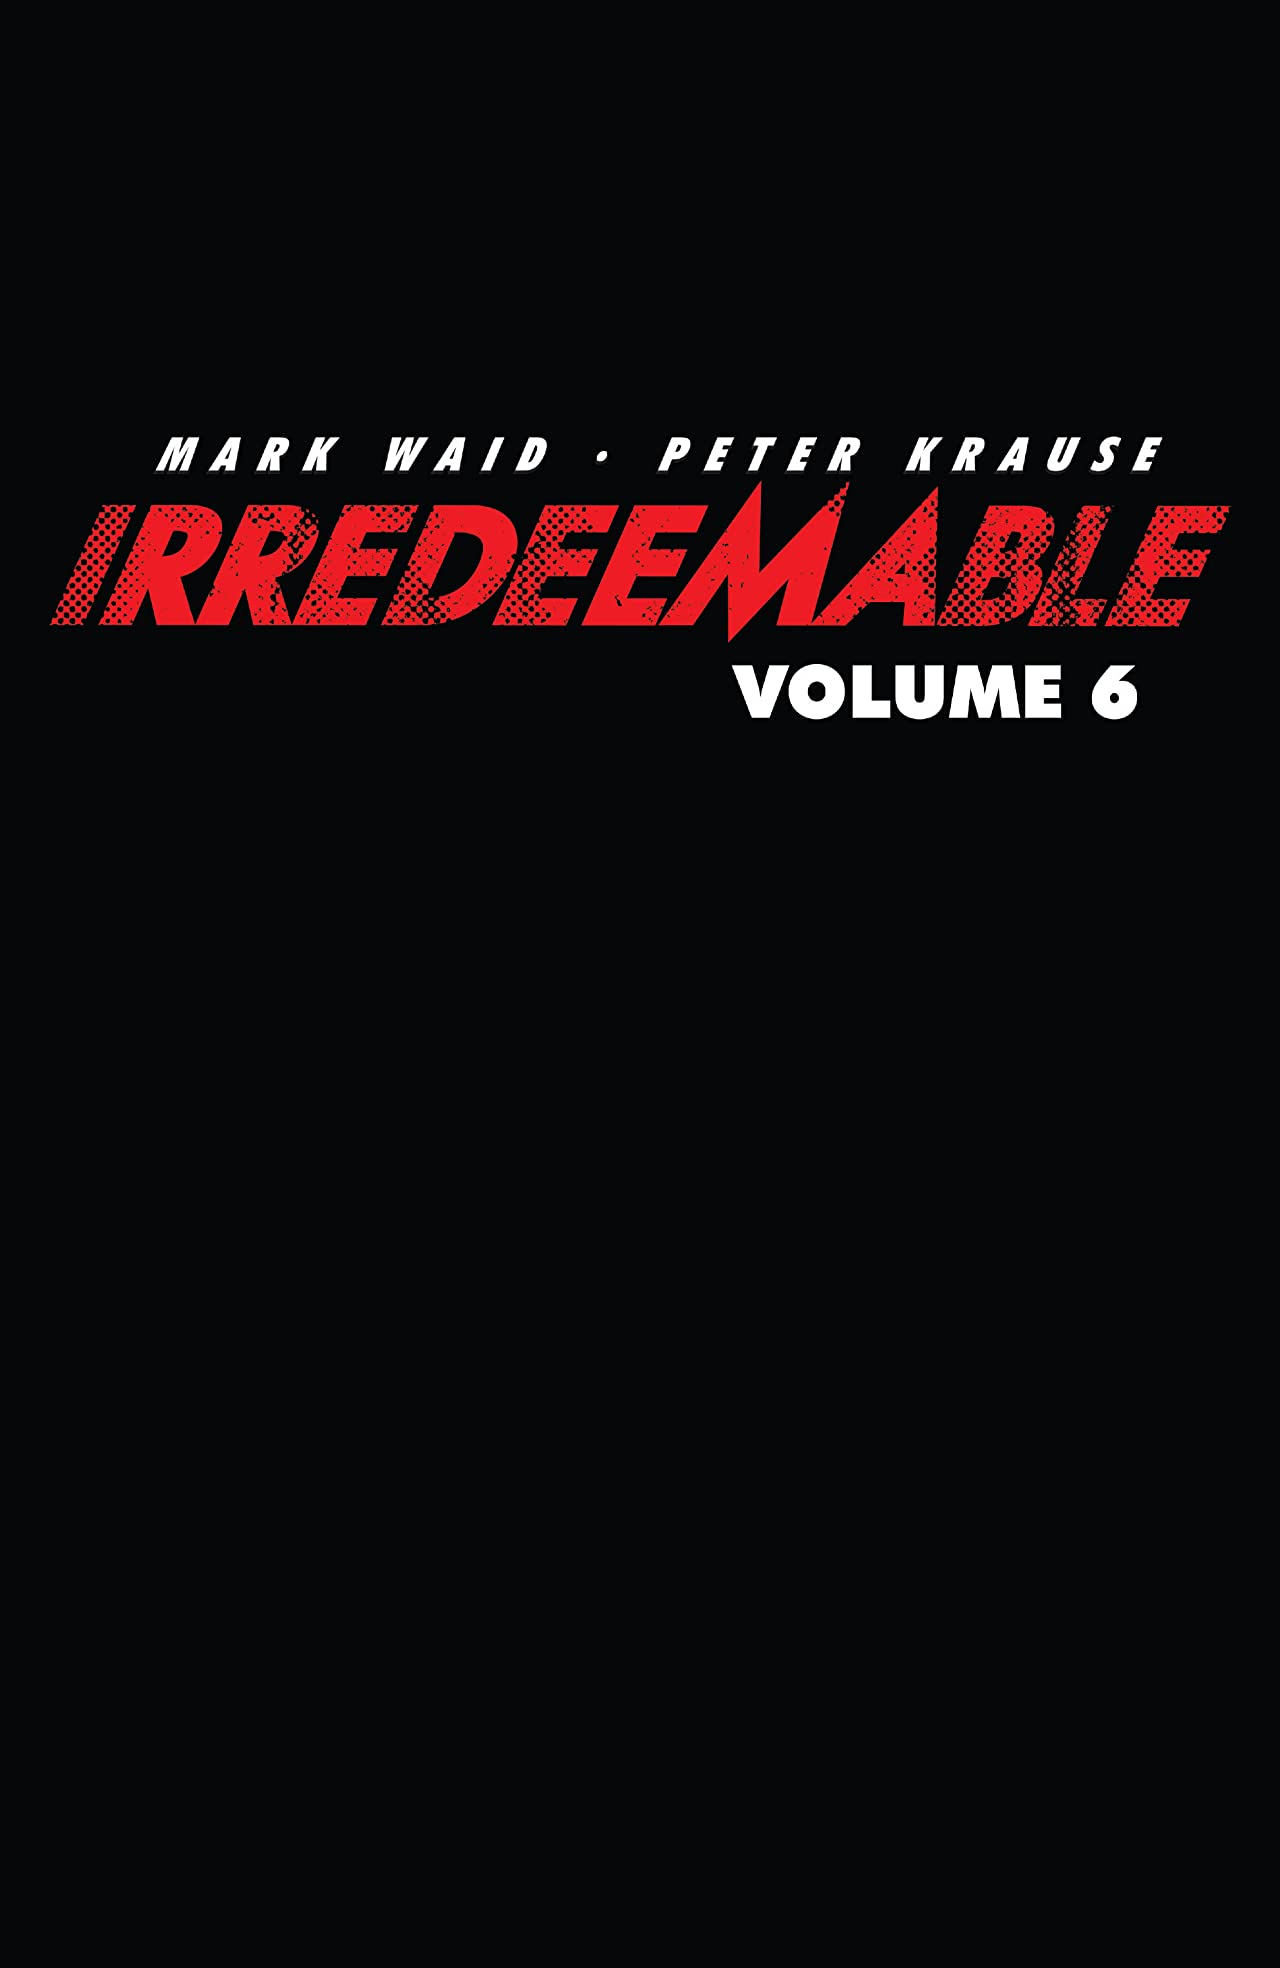 Irredeemable Vol. 6